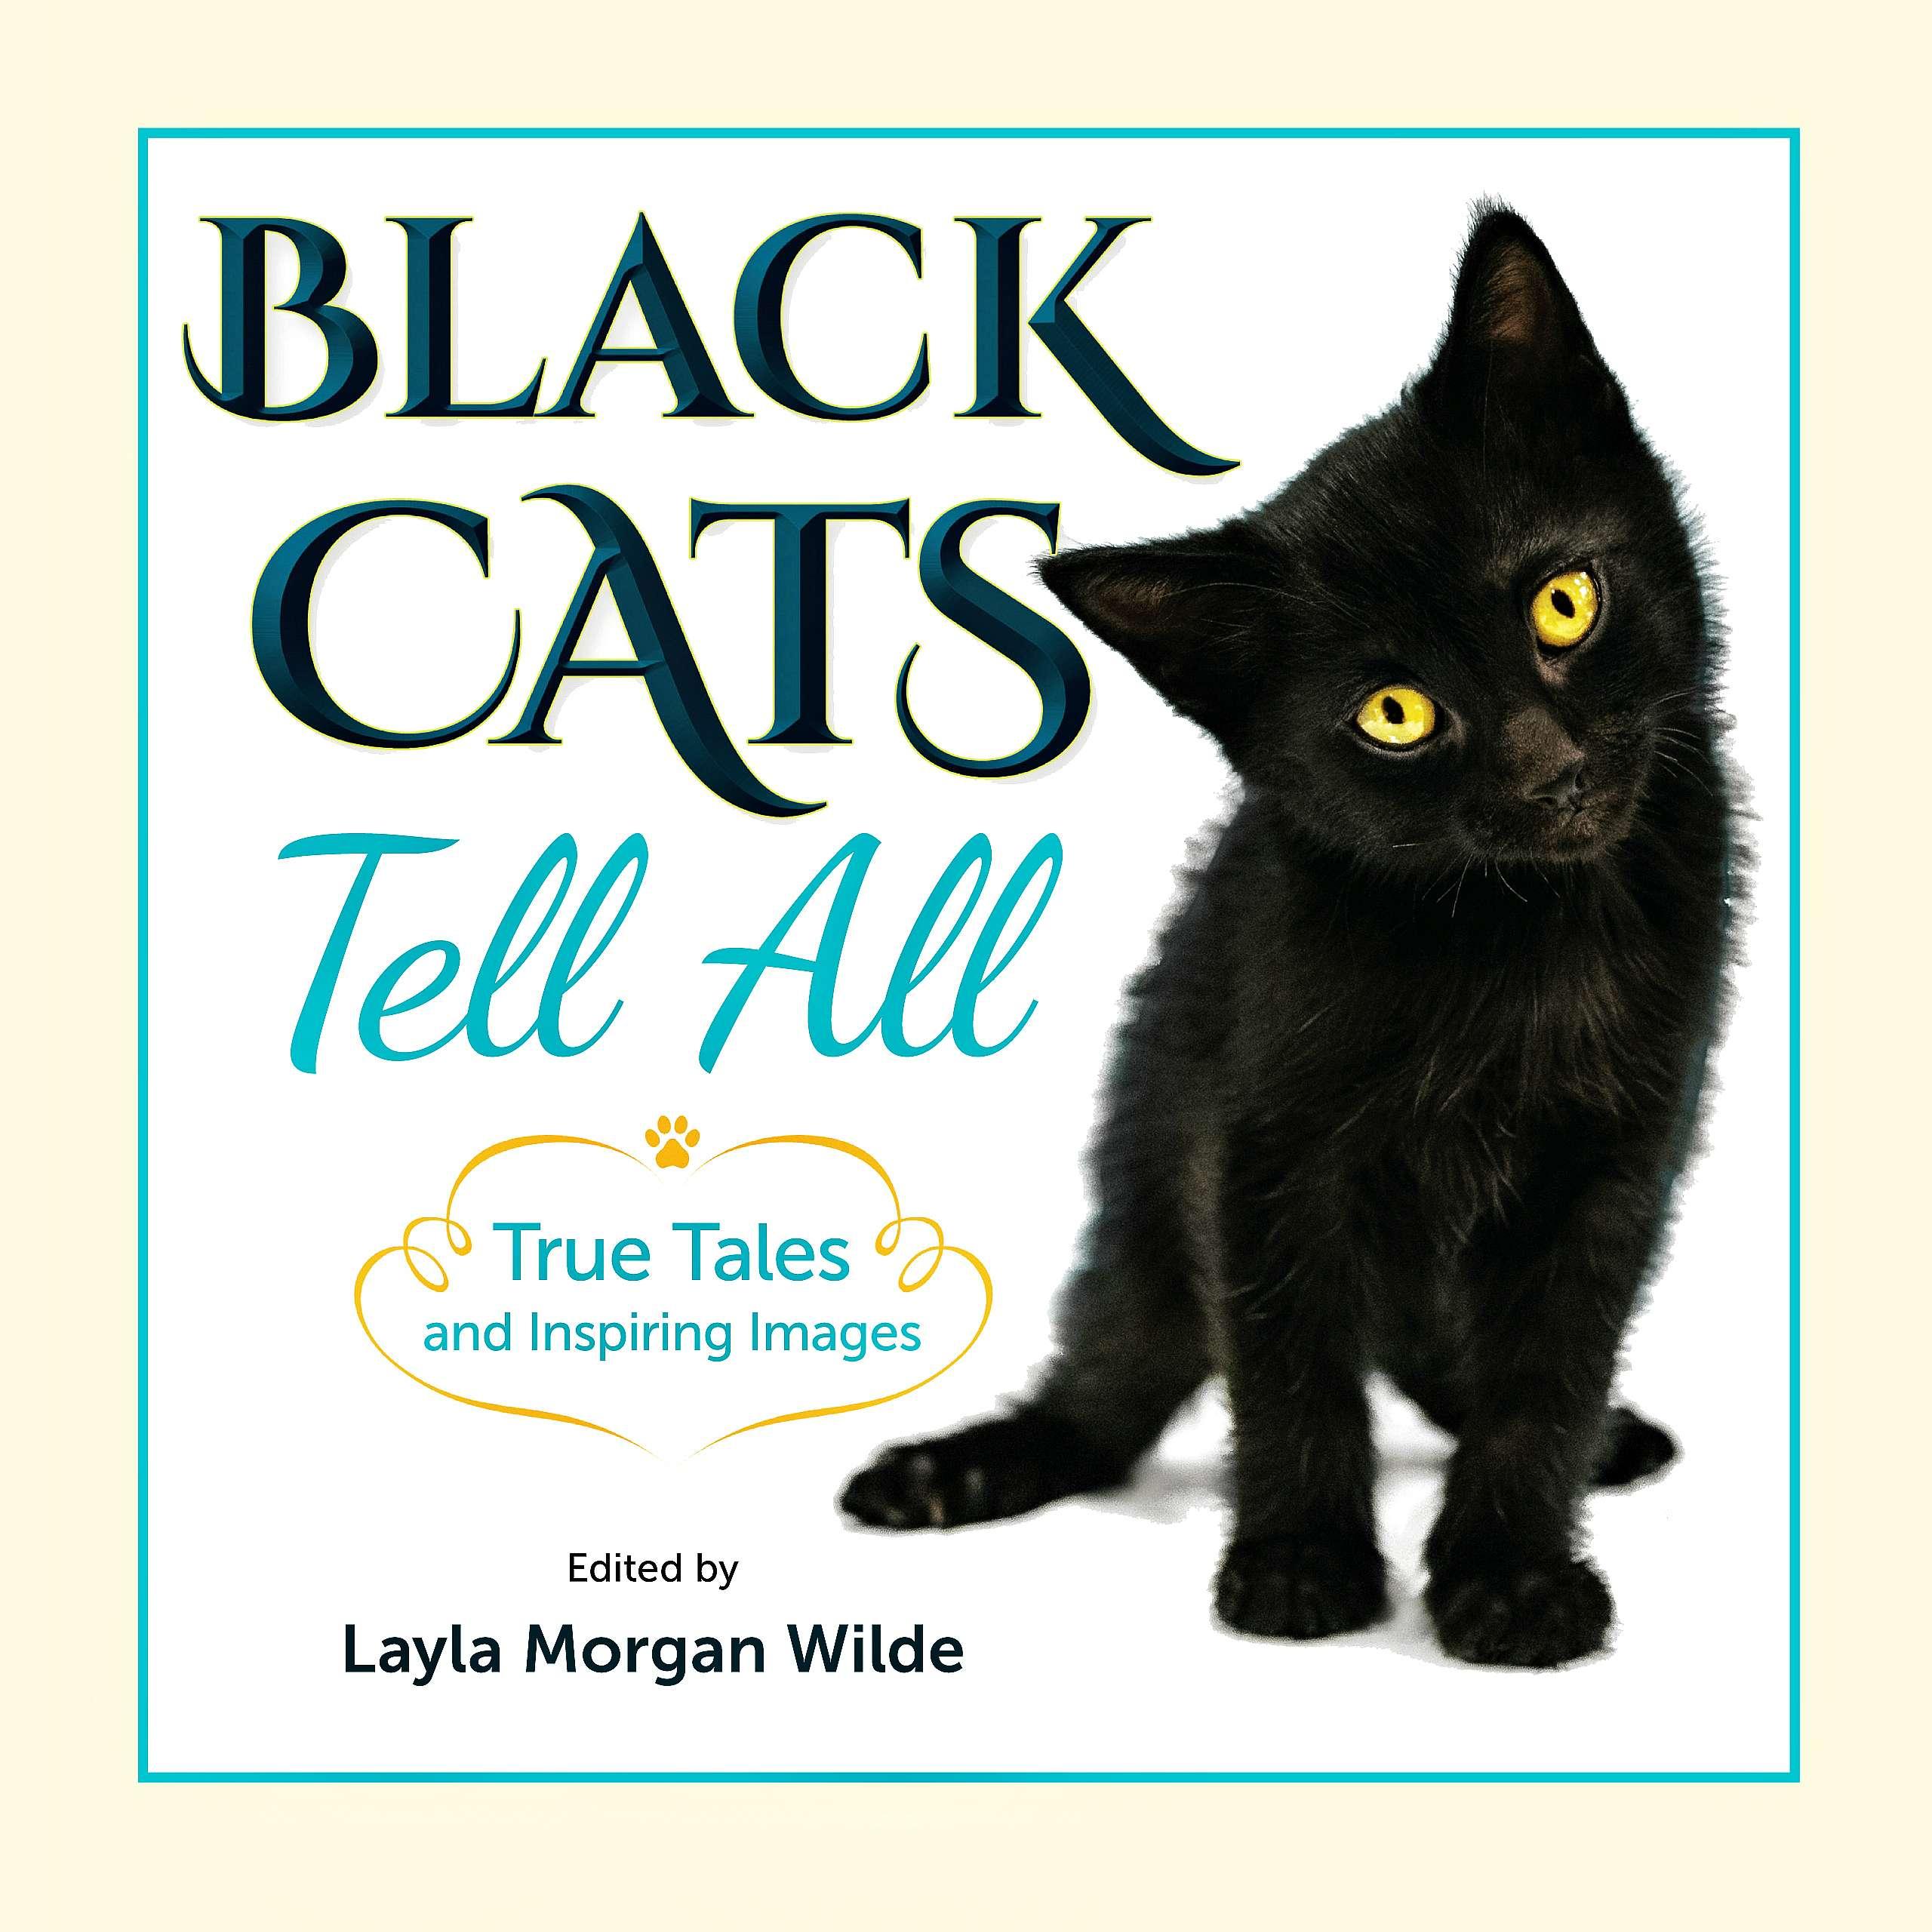 9c37e7f87e Black Cats Tell All  True Tales and Inspiring Images - Van Cat Meow